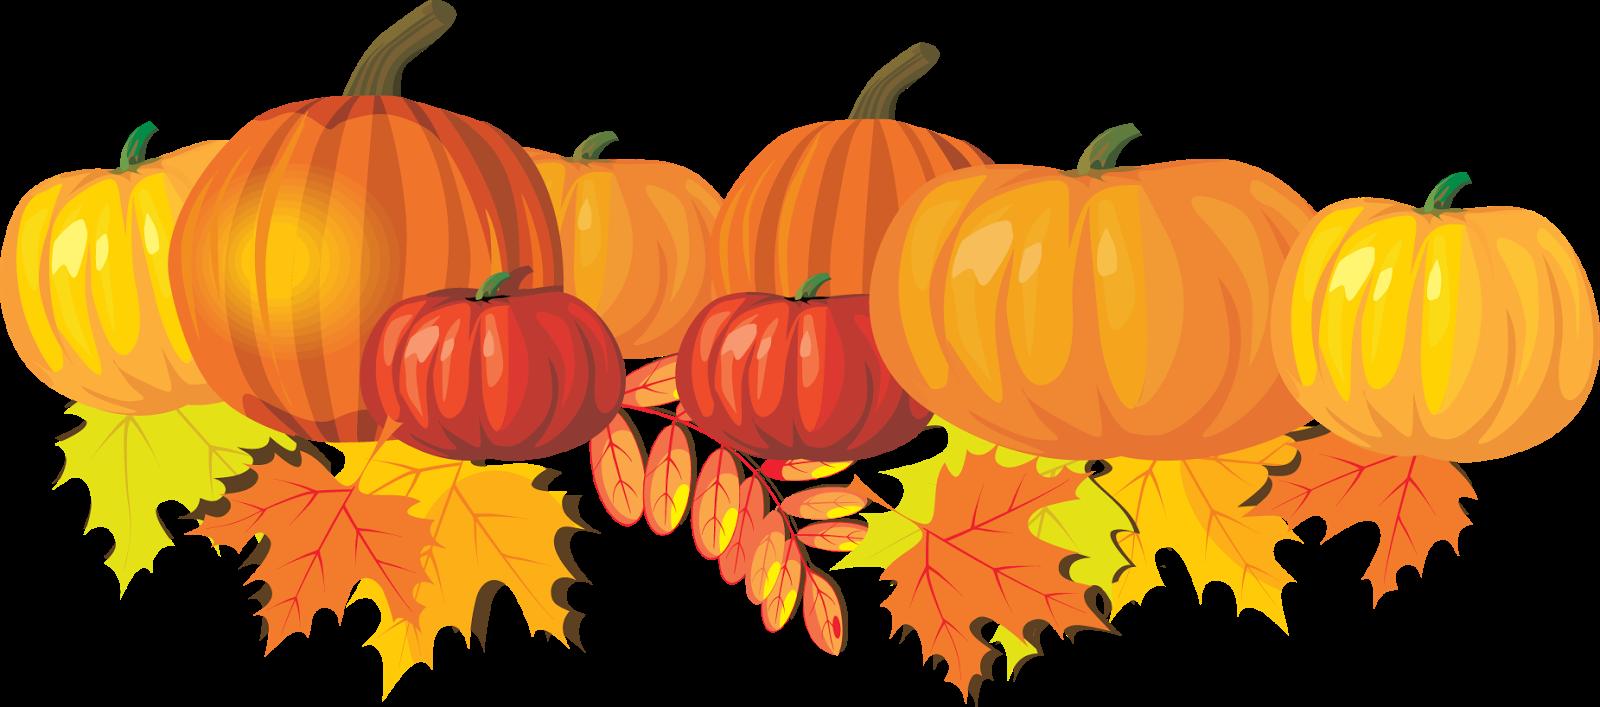 Trendy pumpkin clipart transparent library Cuttlebug Mania: Hello Sweet Pumpkin transparent library